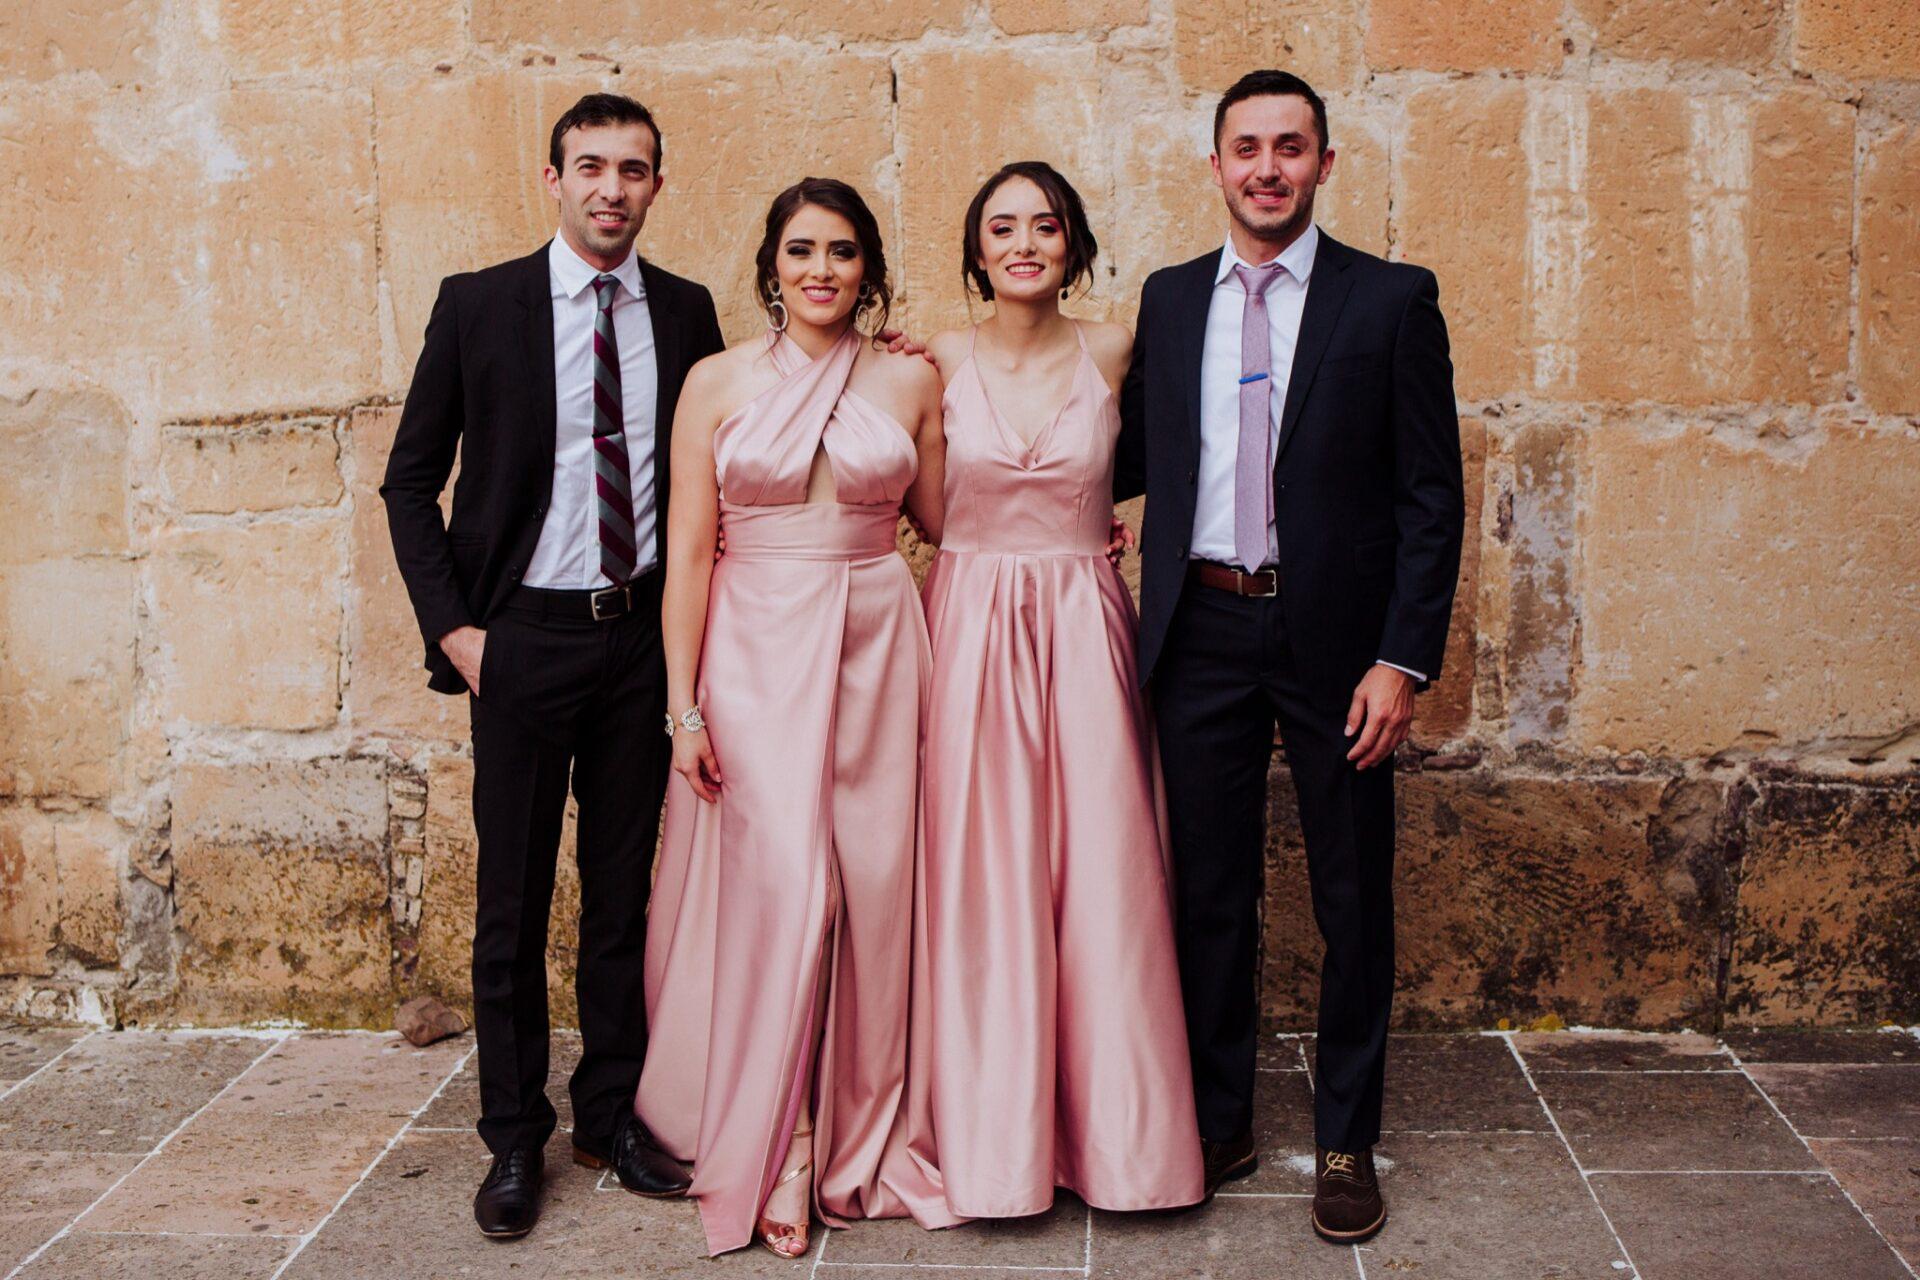 javier_noriega_fotografo_bodas_teul_zacatecas_wedding_photographer3a